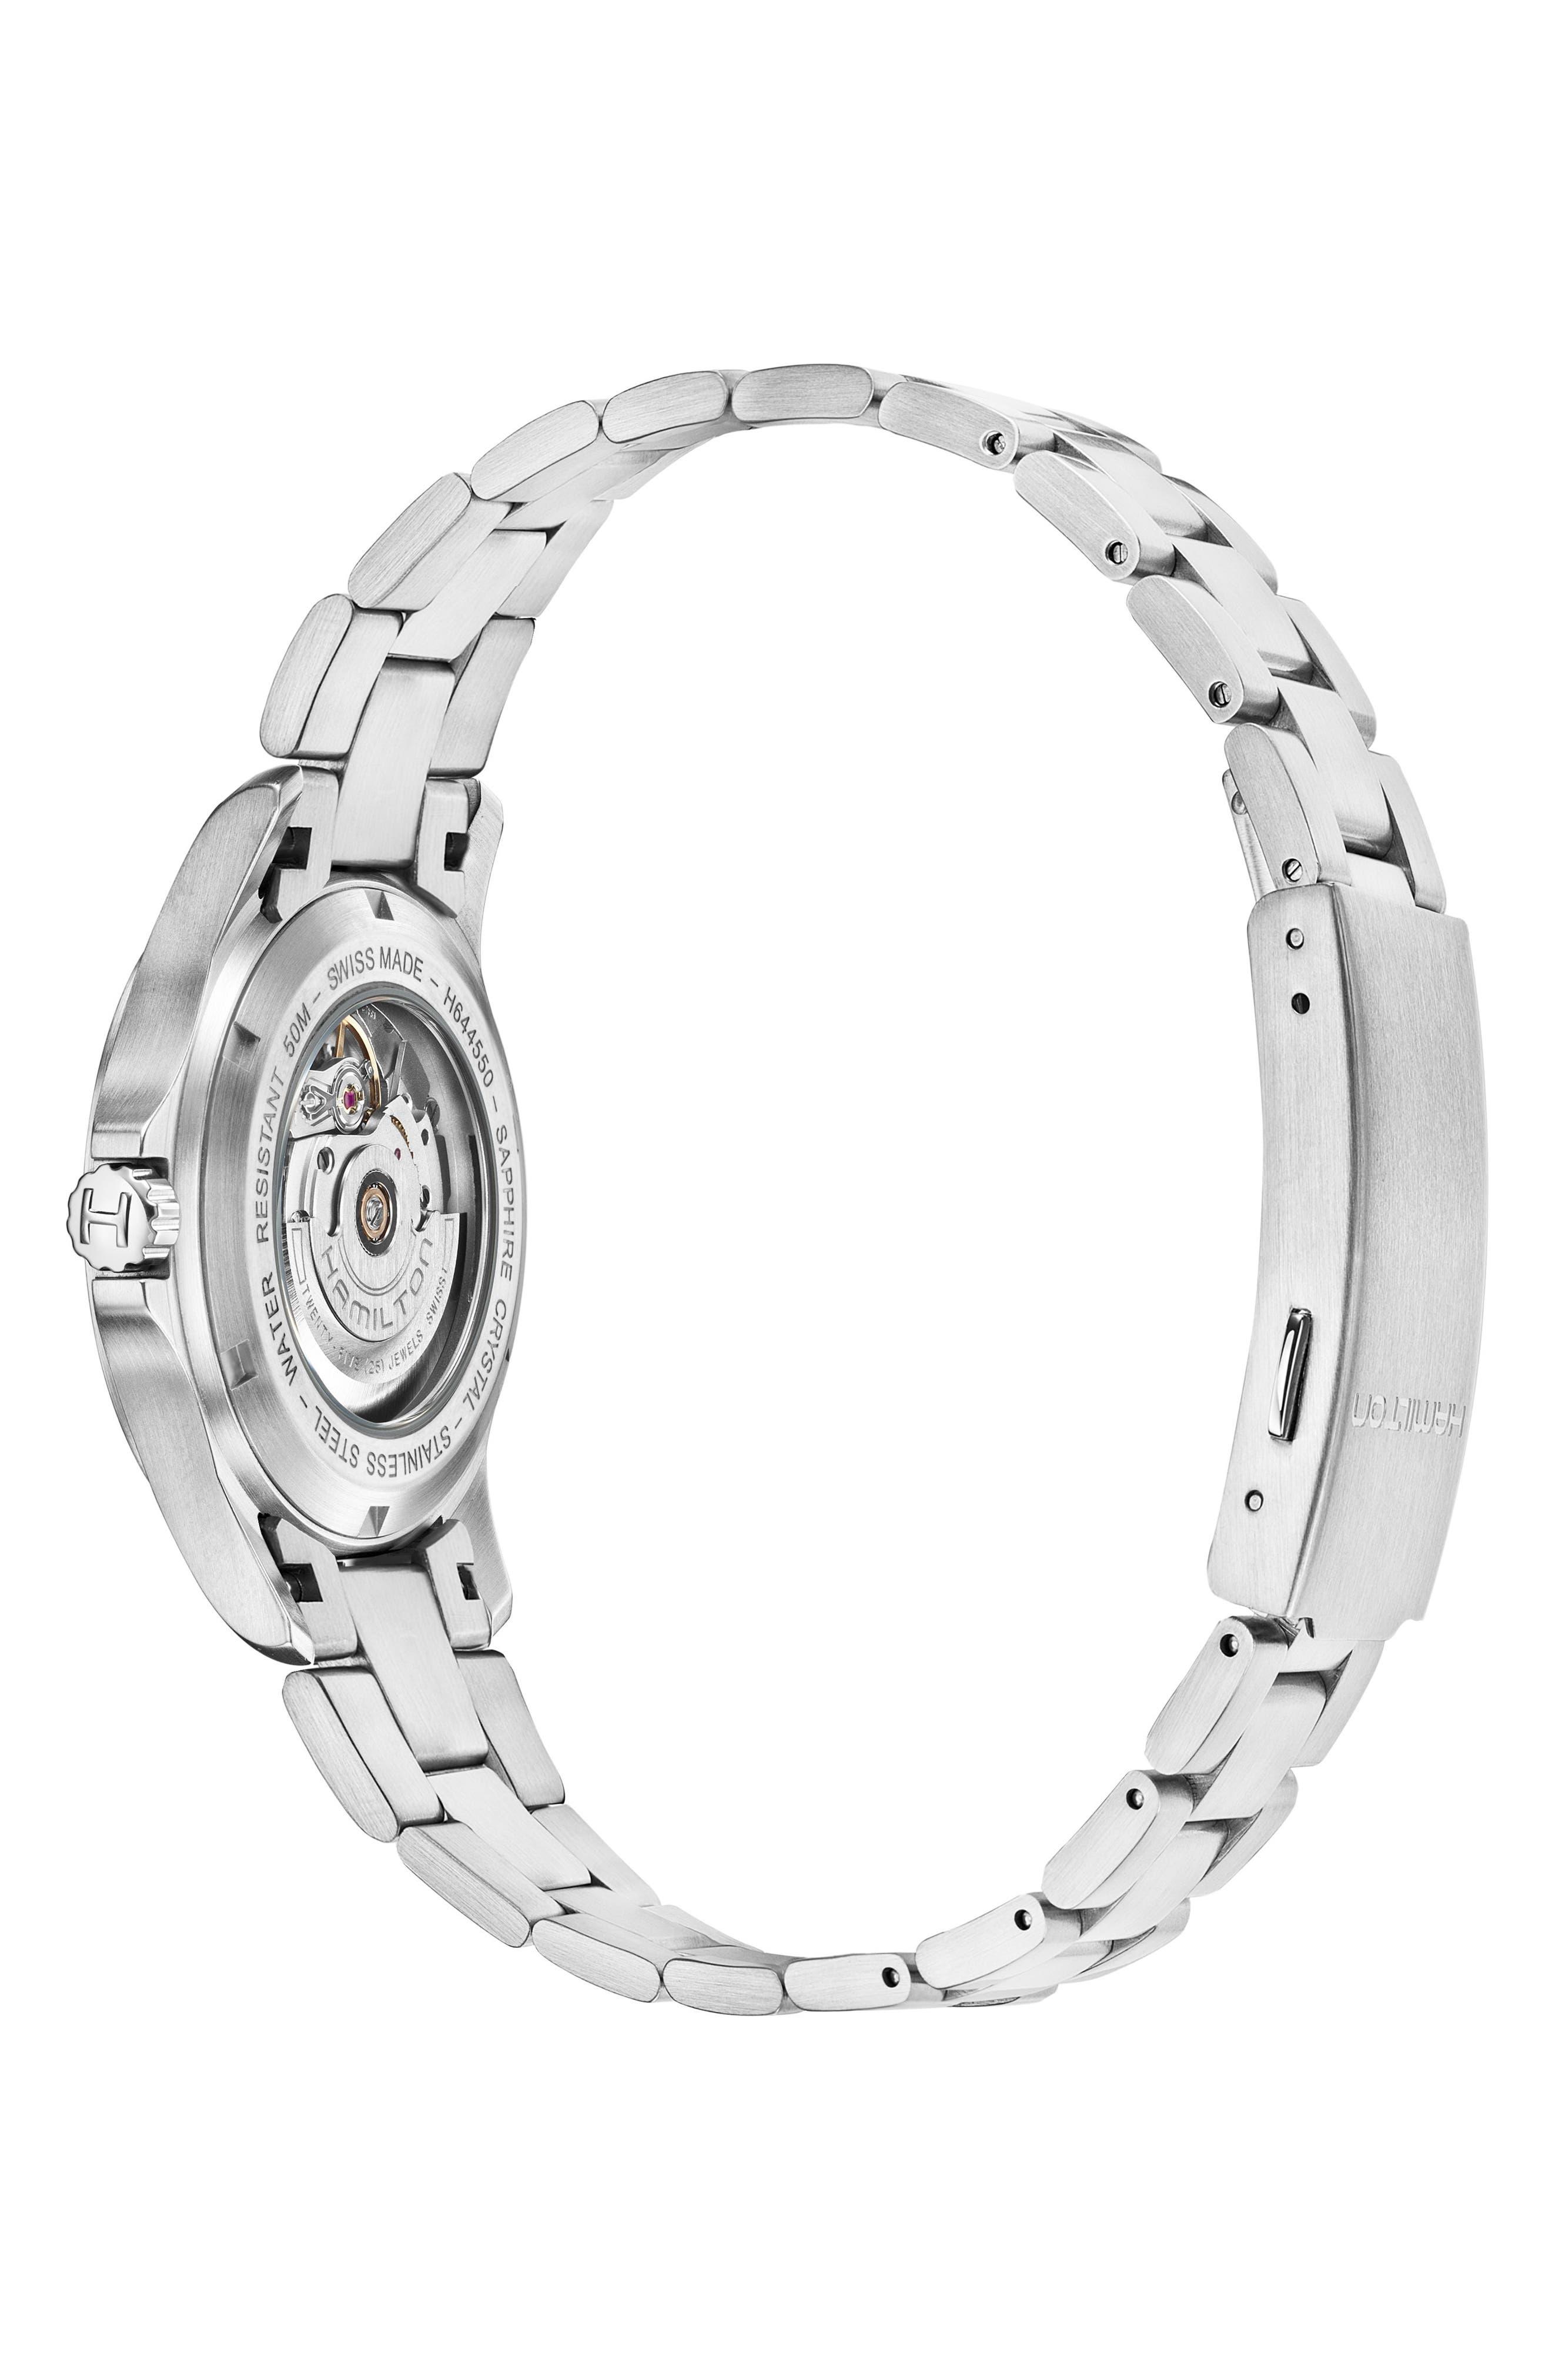 Khaki Field King Automatic Bracelet Watch, 40mm,                             Alternate thumbnail 5, color,                             Silver/ Black/ Silver